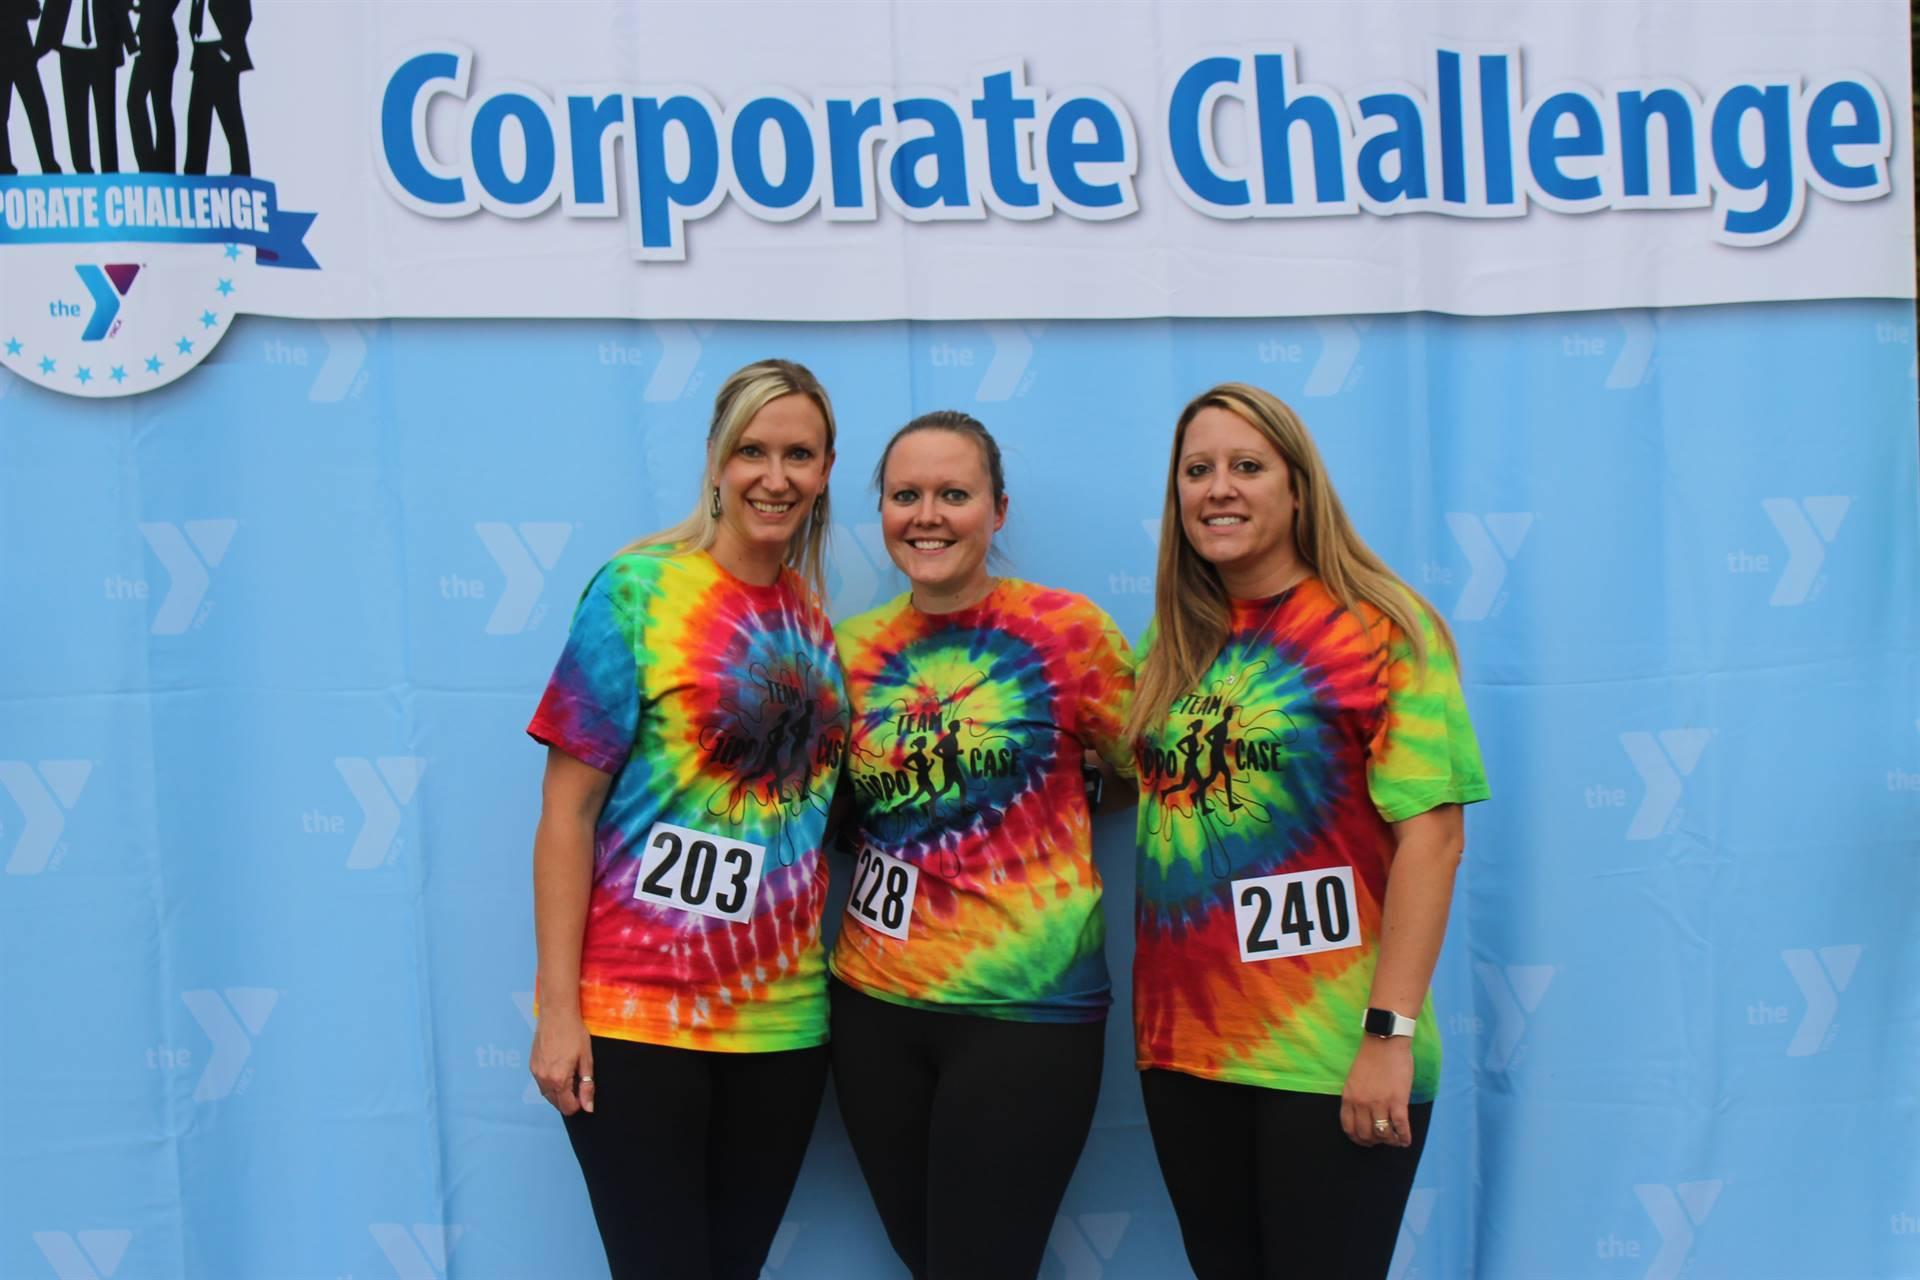 Three women in front of corporate challenge banner